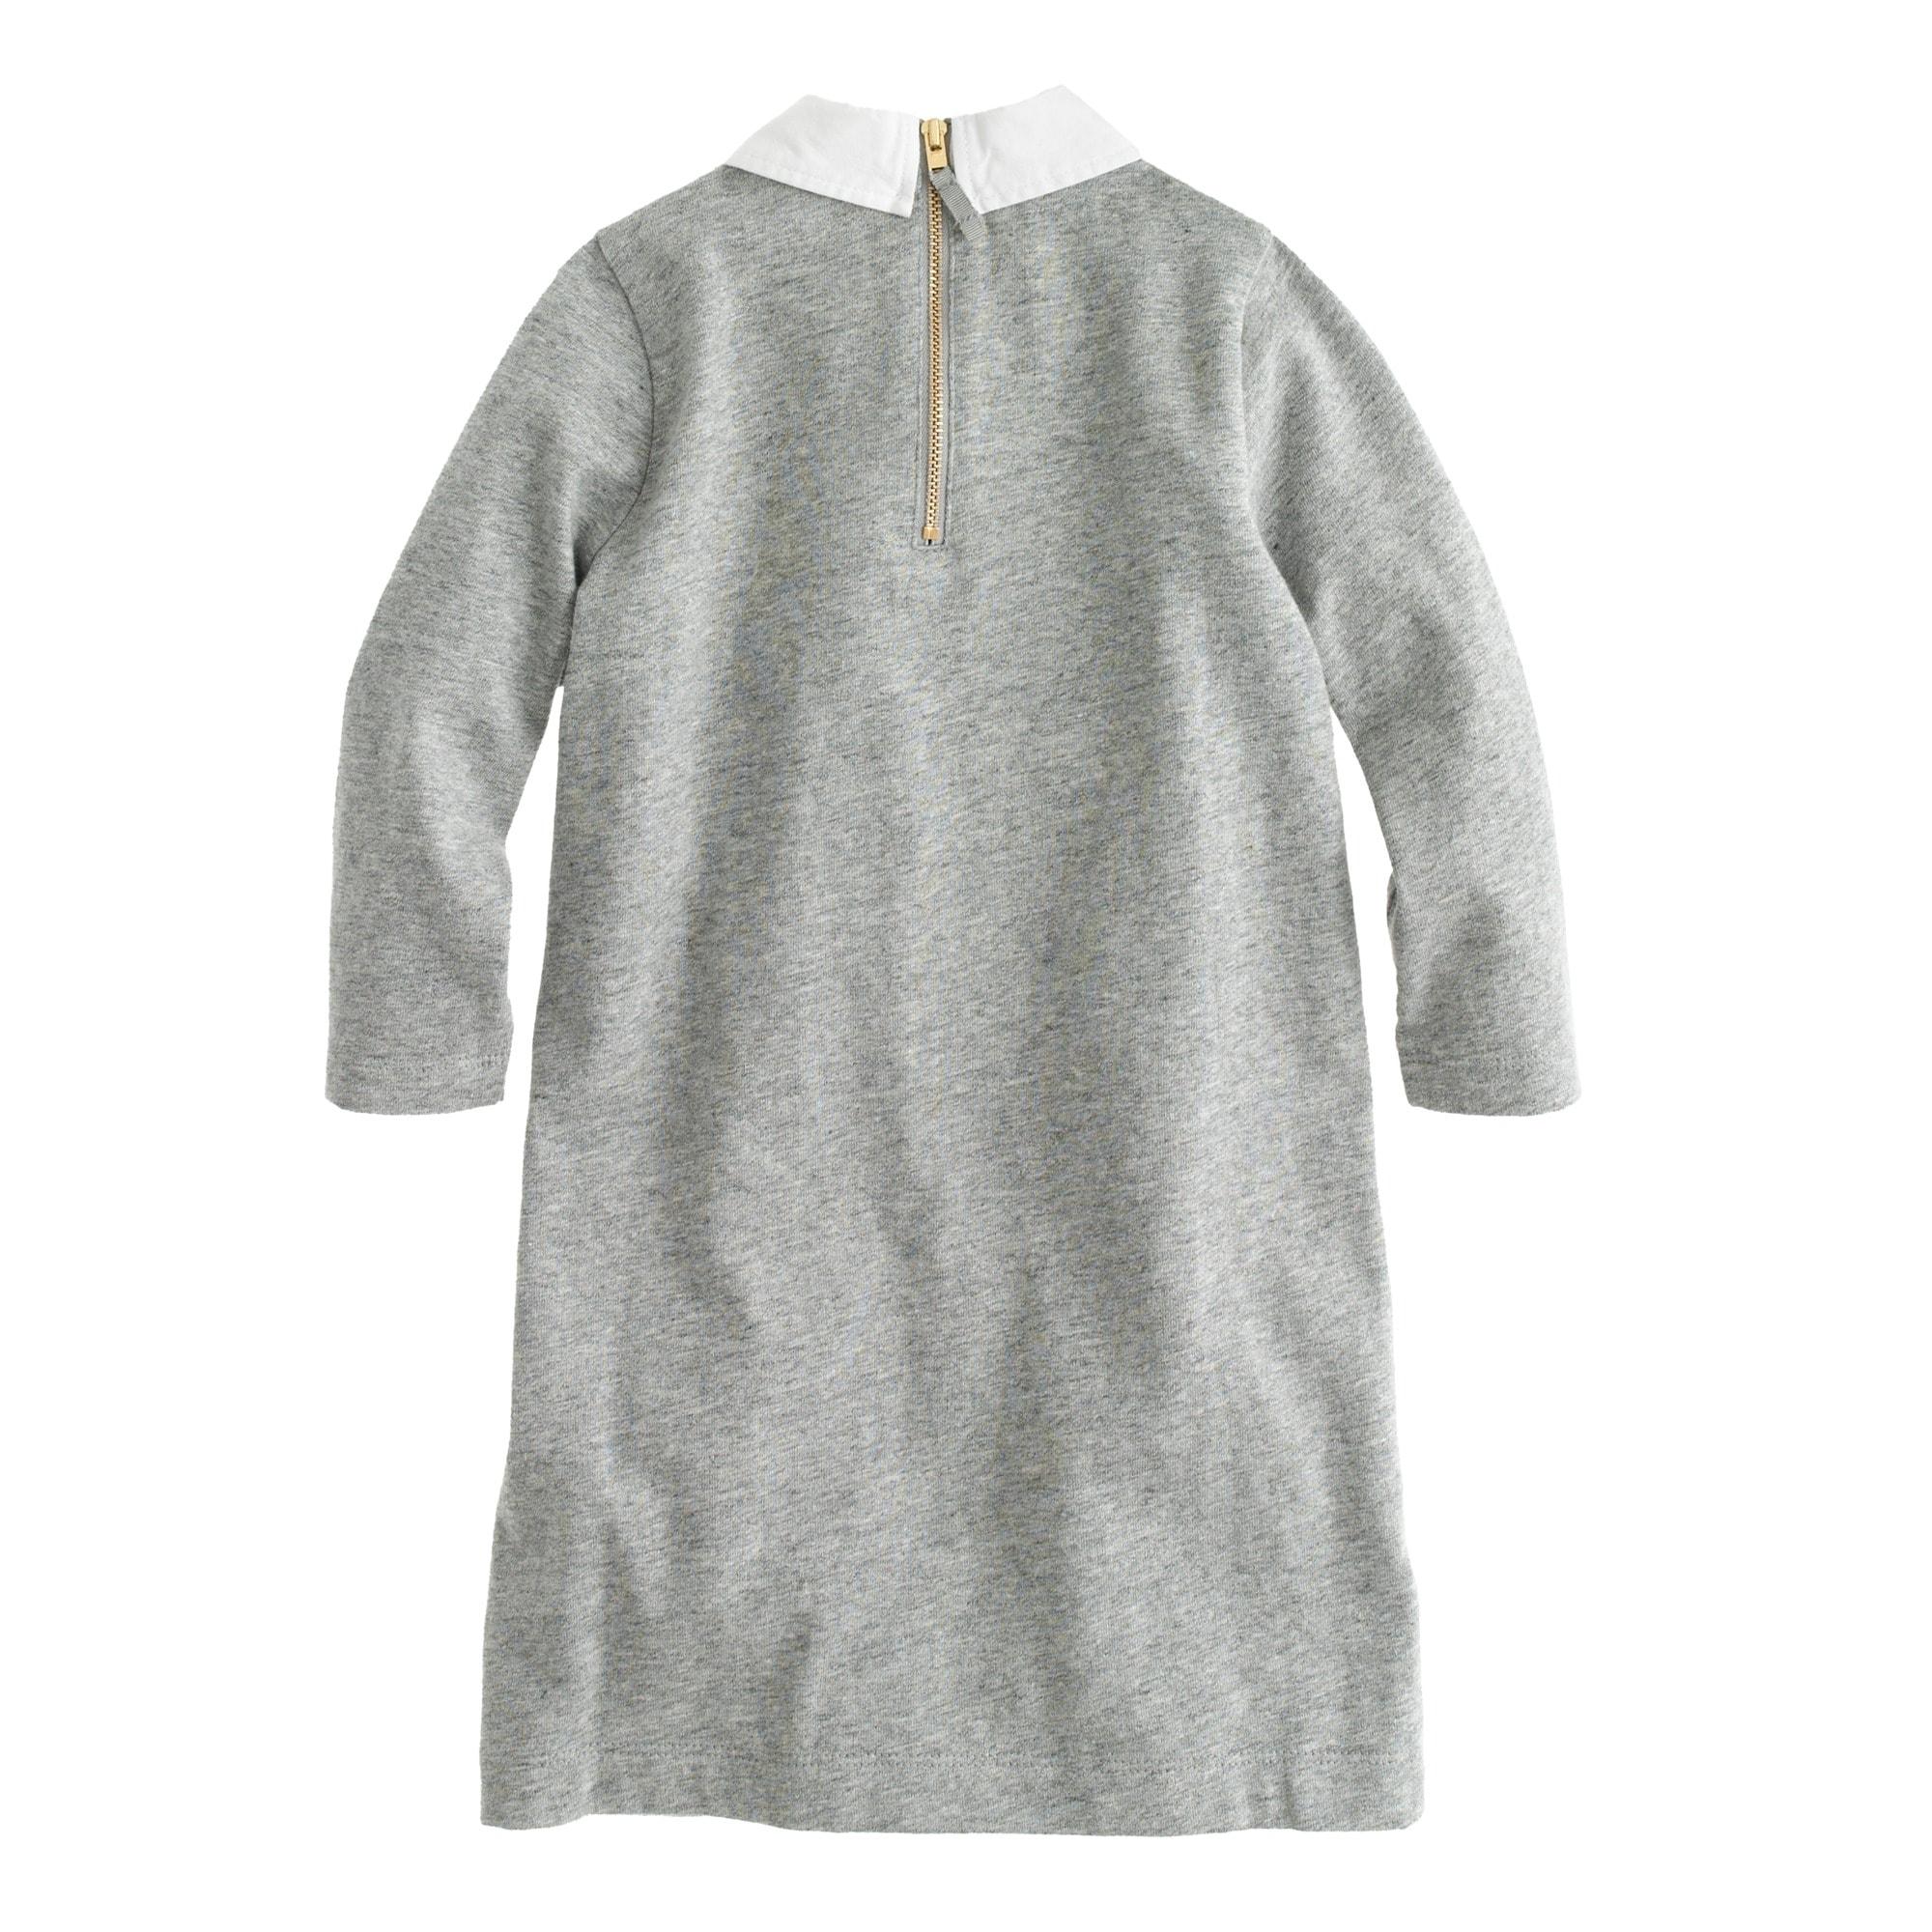 Girls' collared sweatshirt dress